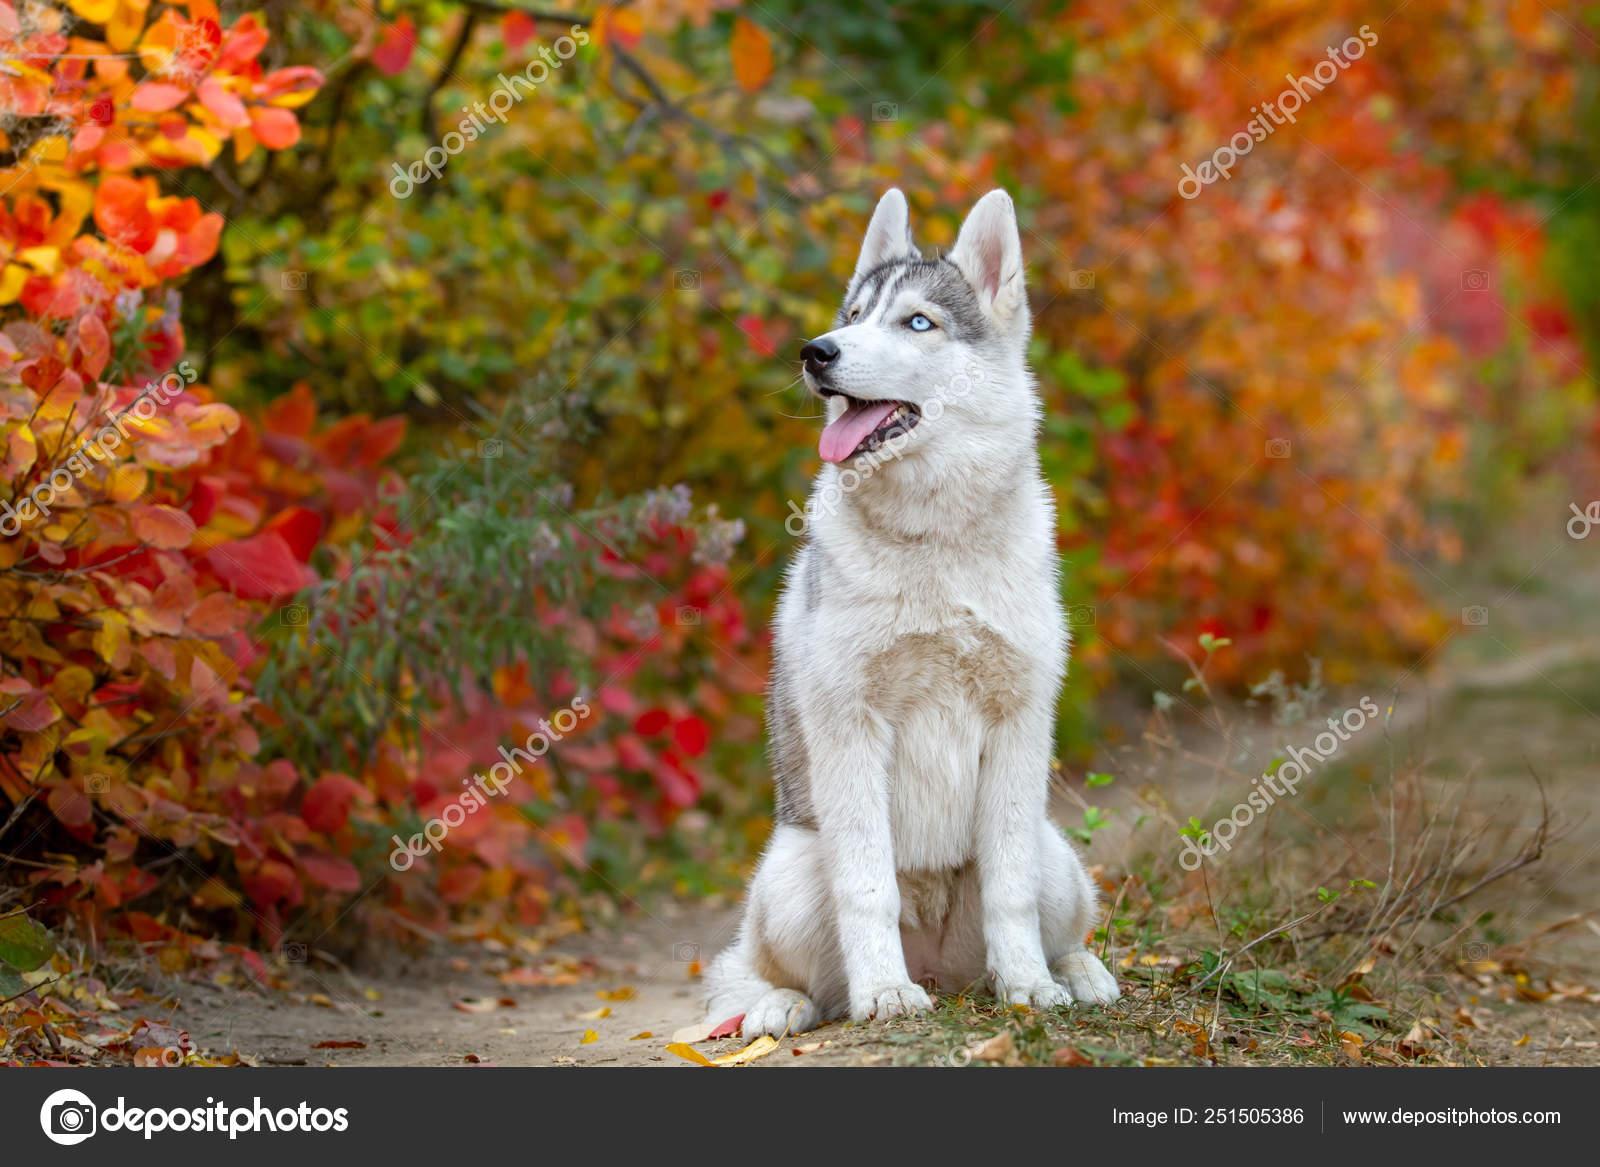 Closeup Autumn Portrait Of Siberian Husky Puppy A Young Grey White Husky A Park Stock Photo C Manickafoto Gmail Com 251505386